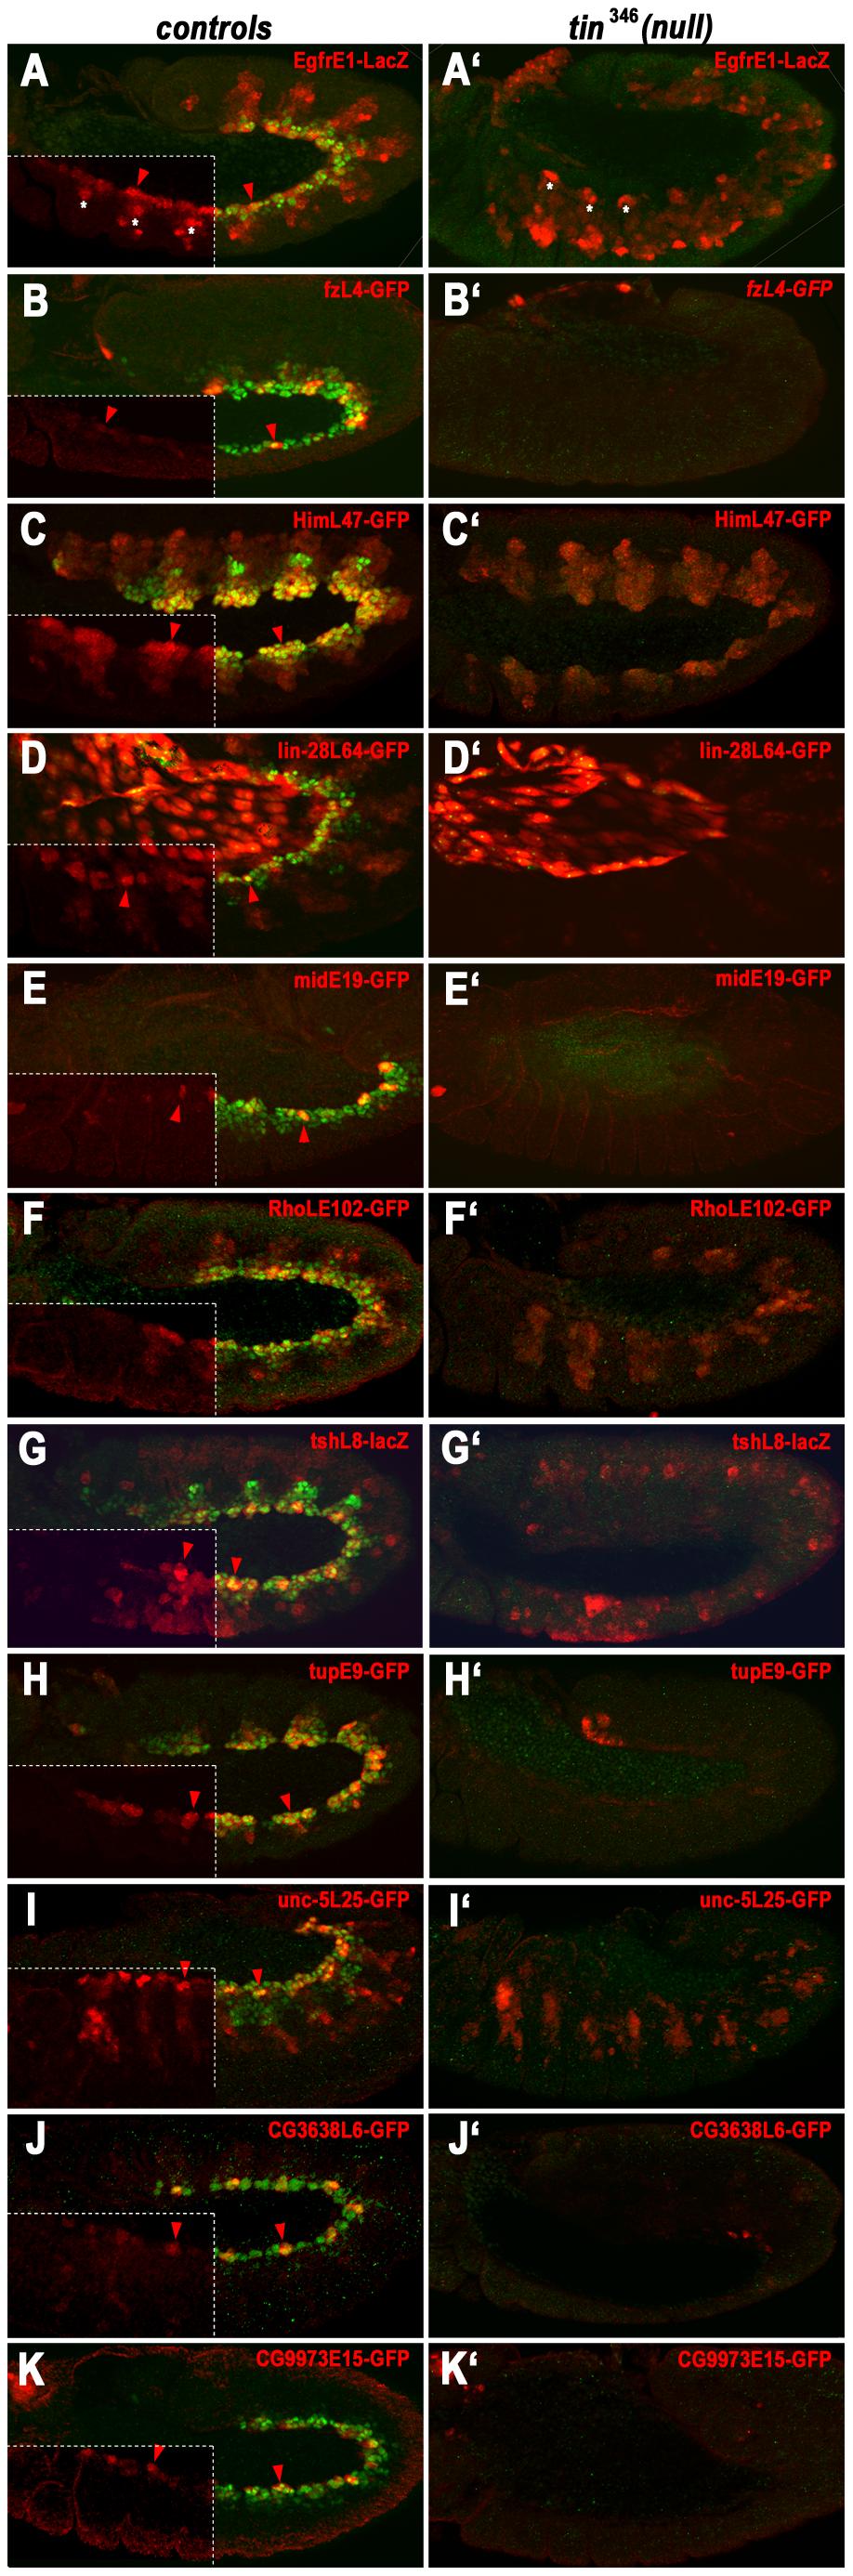 Dependency of early cardiac enhancer activities on <i>tin</i>.